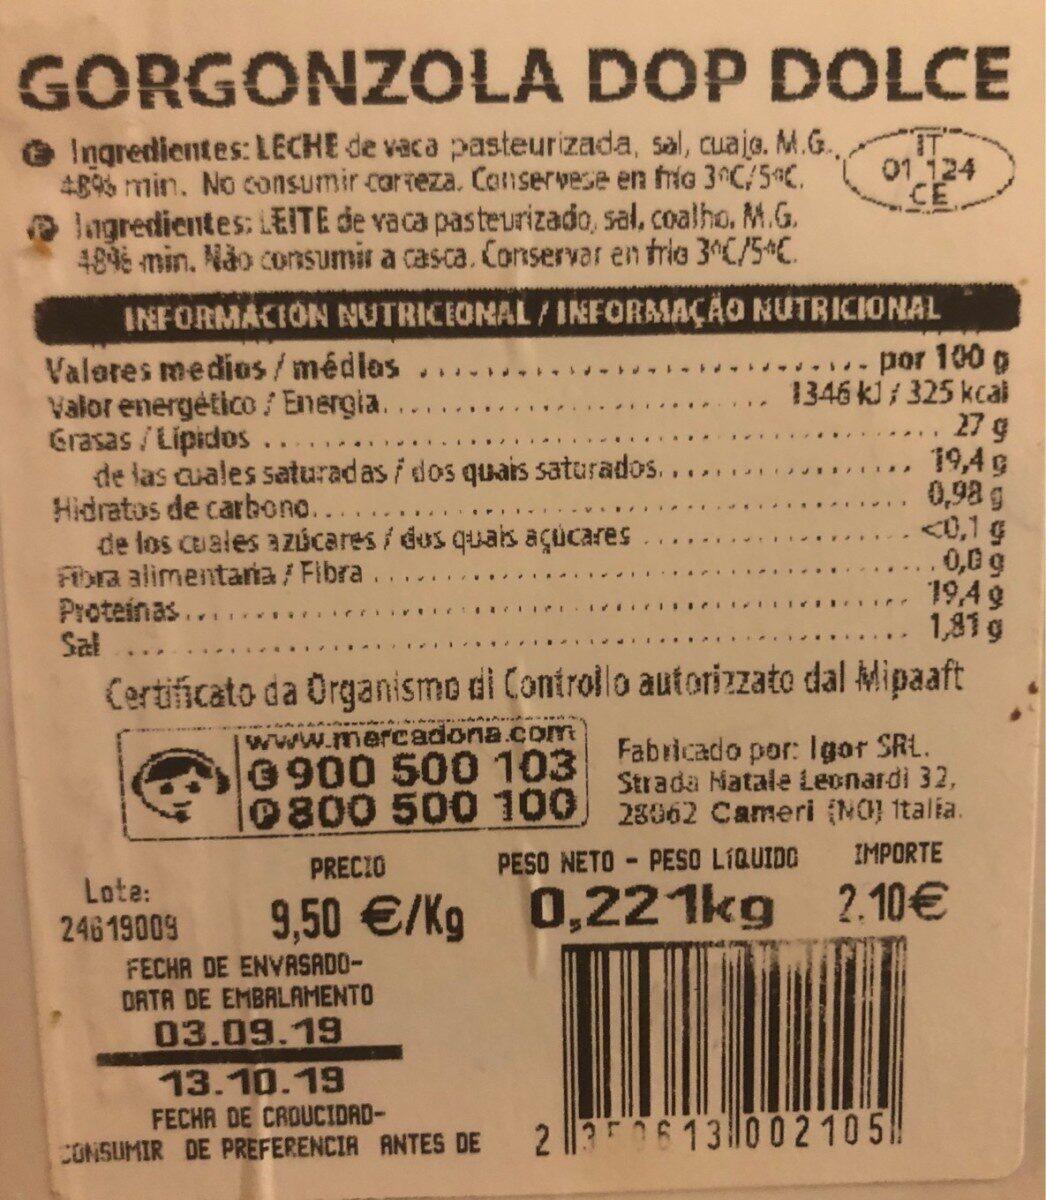 gorgonzola - Informació nutricional